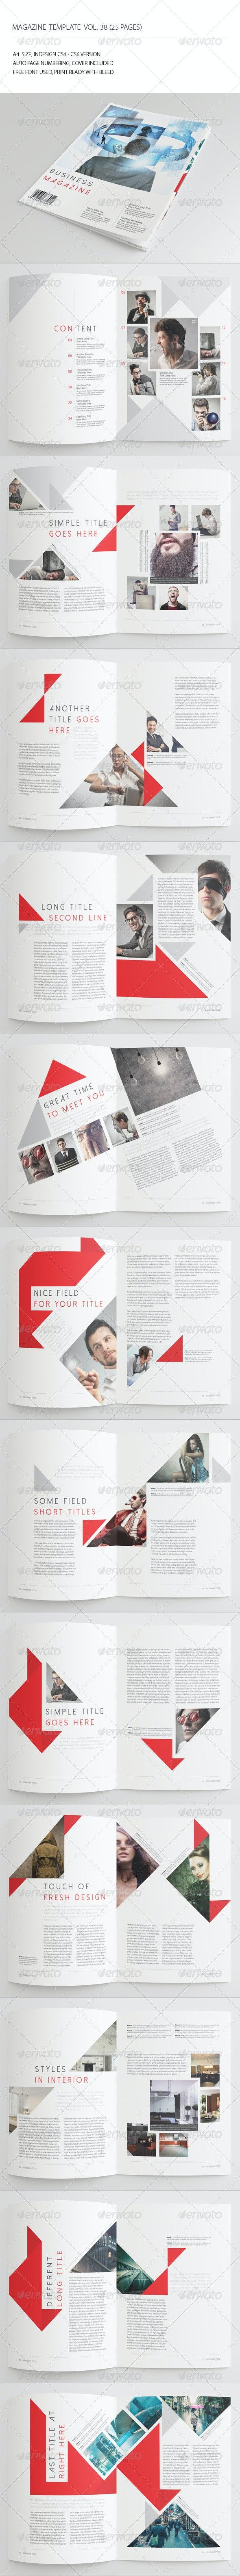 25 Pages Business Magazine Vol38 - Magazines Print Templates